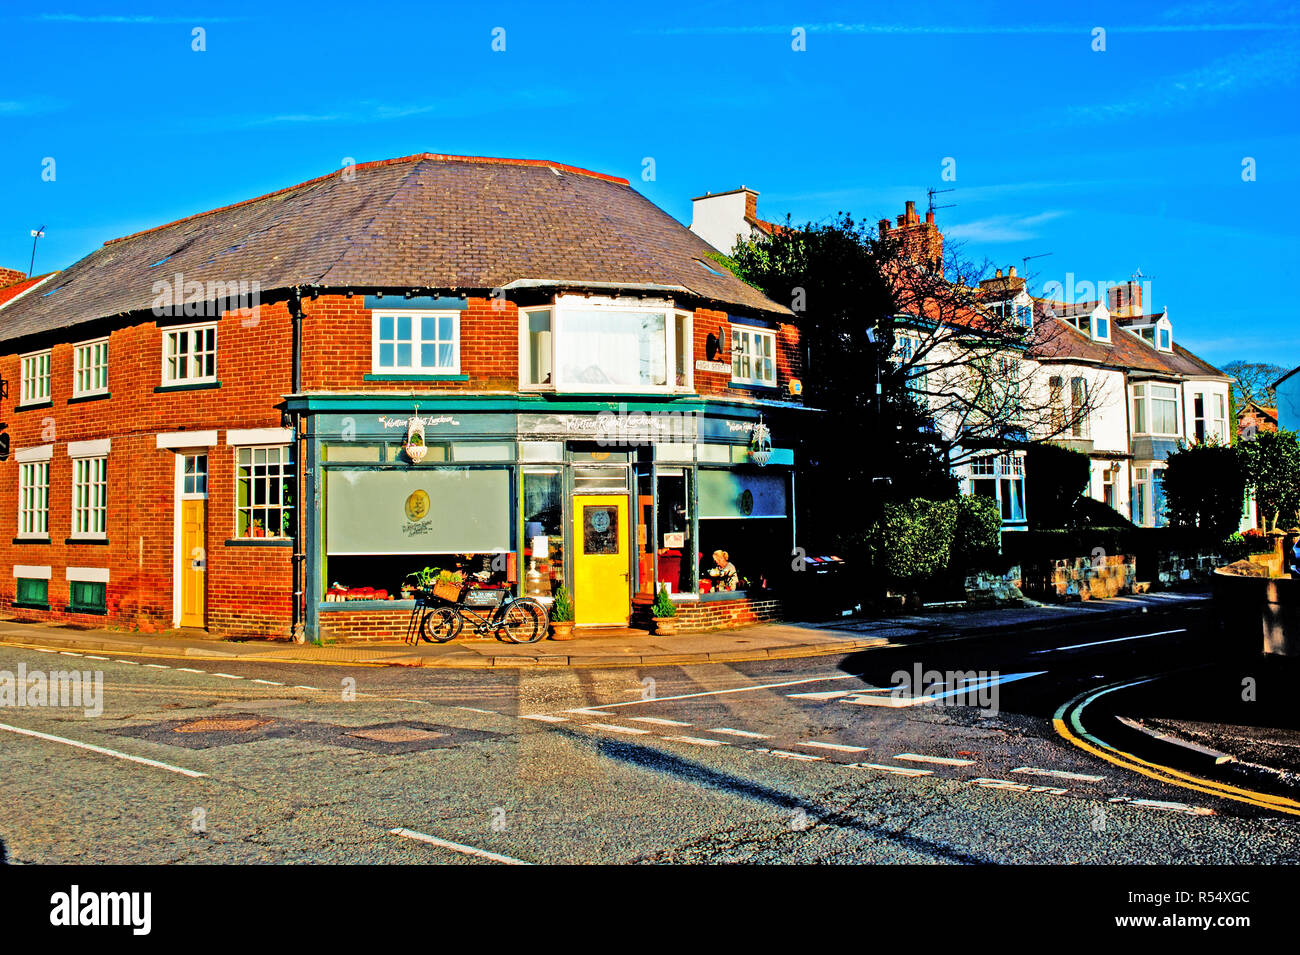 Velveteen Rabbitt Luncheon Cafe, Great Ayton, North Yorkshire, England - Stock Image